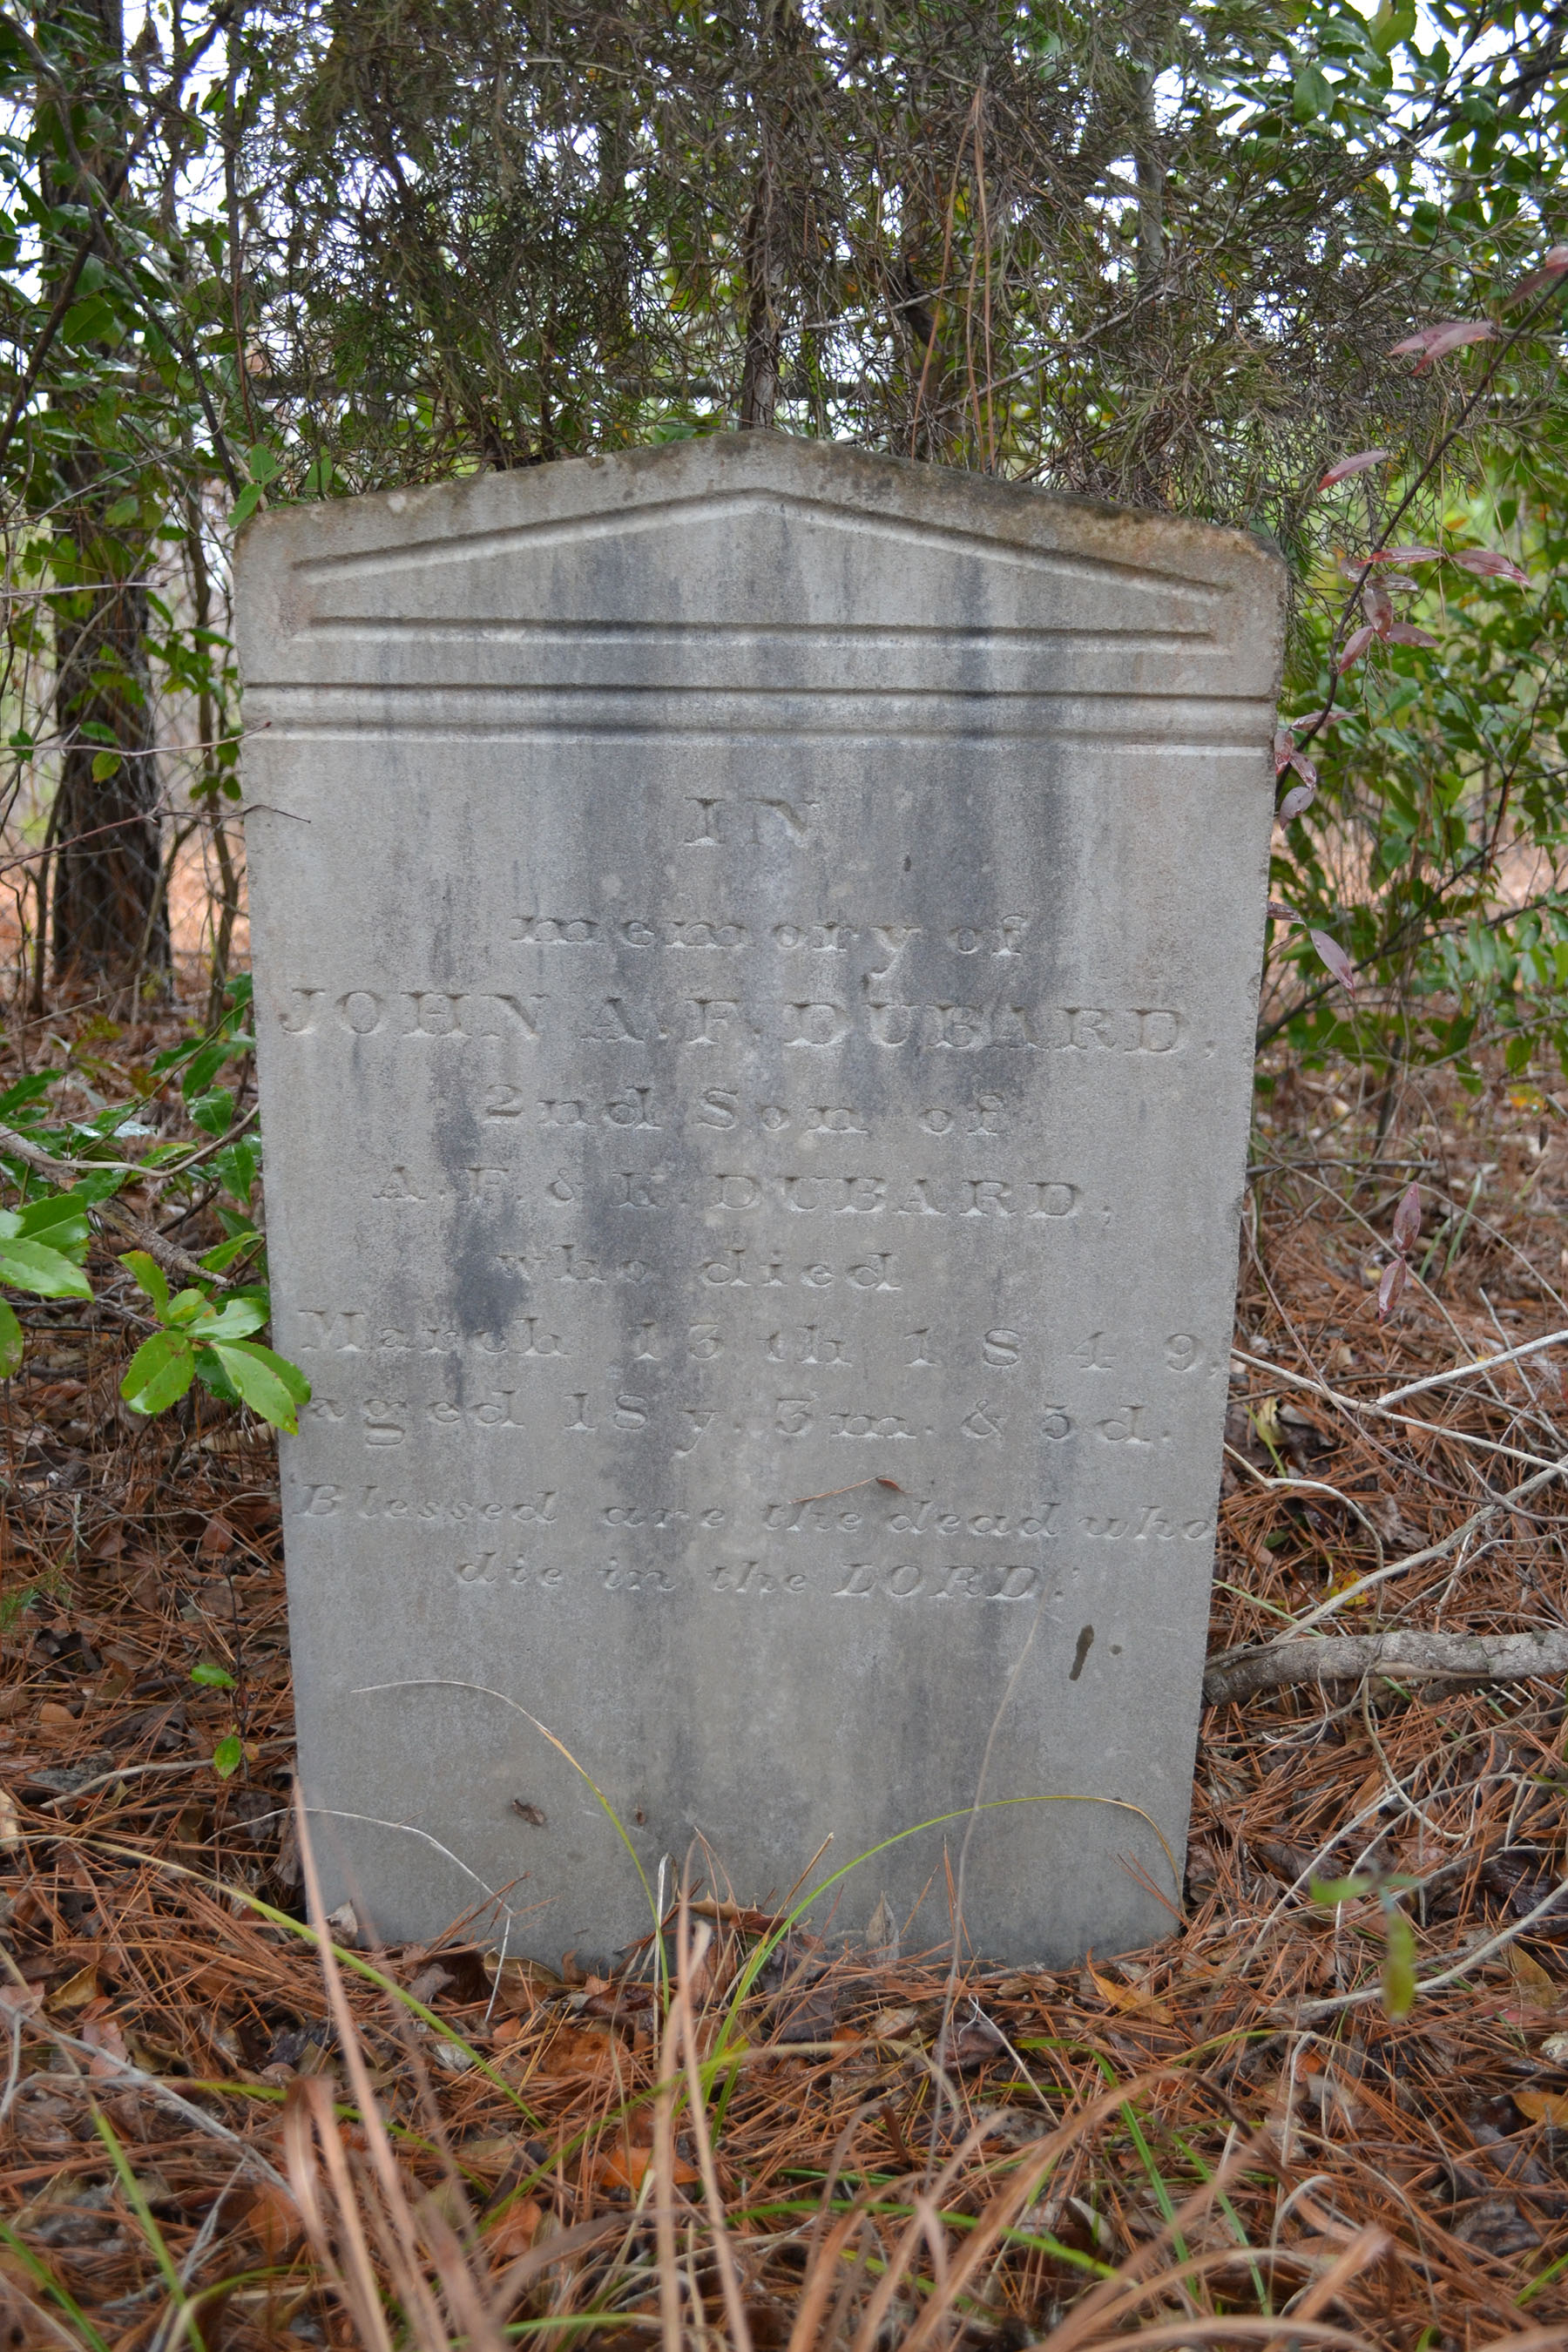 Old Dubard Cemetery 001.jpg